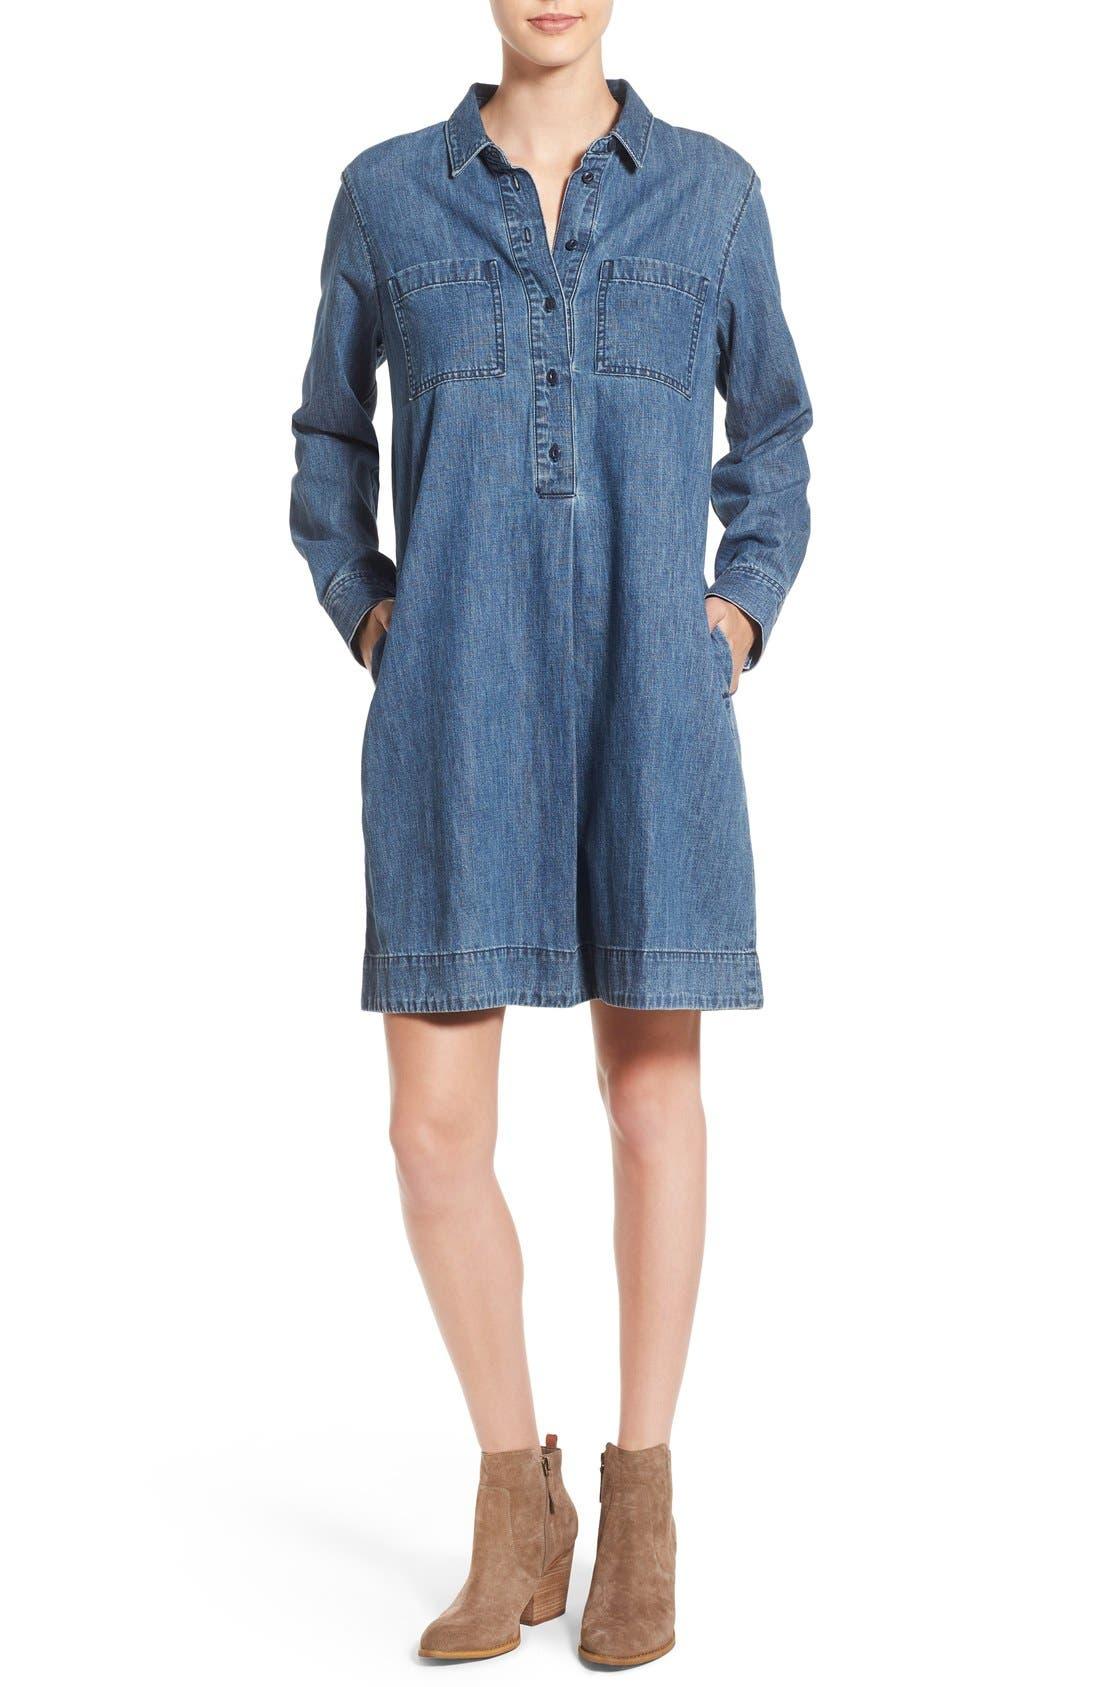 MADEWELL Denim Shirtdress, Main, color, 405